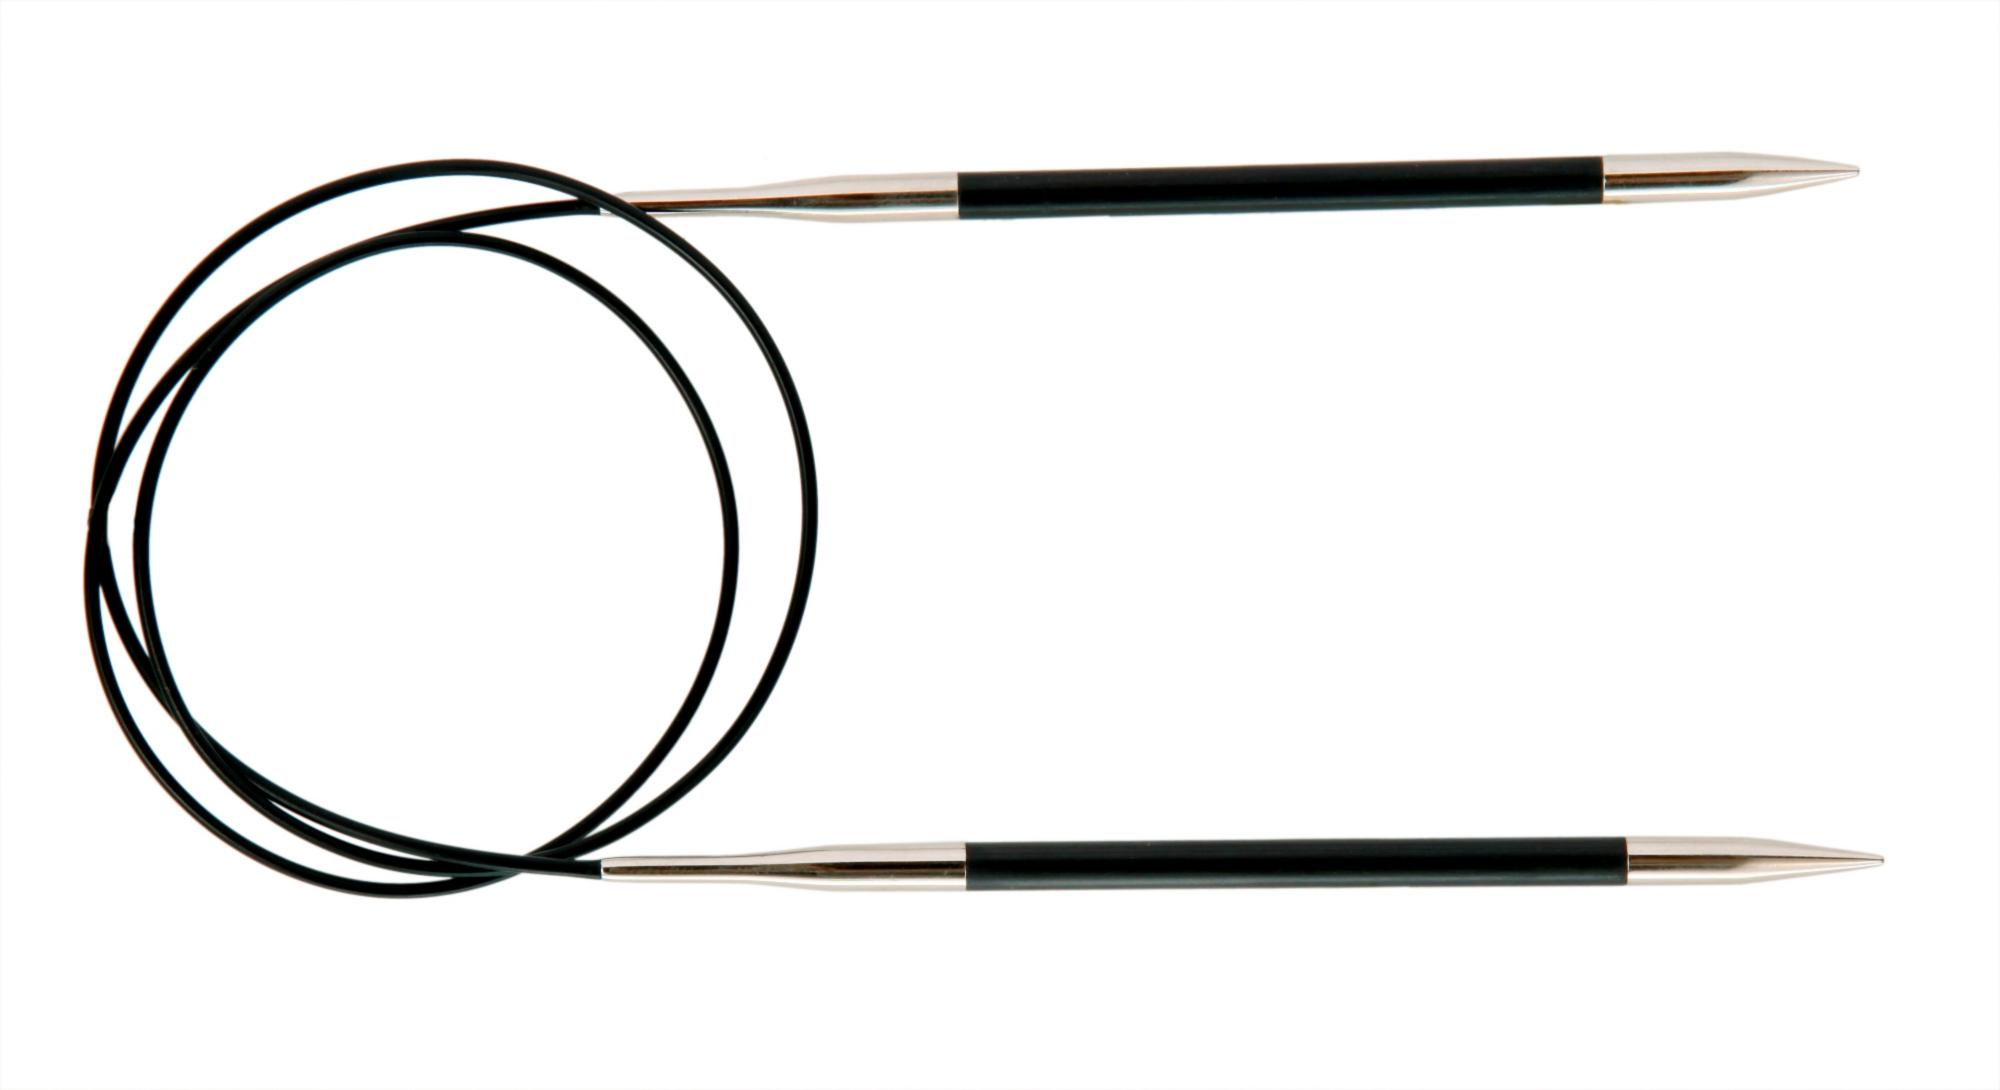 Спицы круговые 80 см Karbonz KnitPro, 41189, 4.50 мм